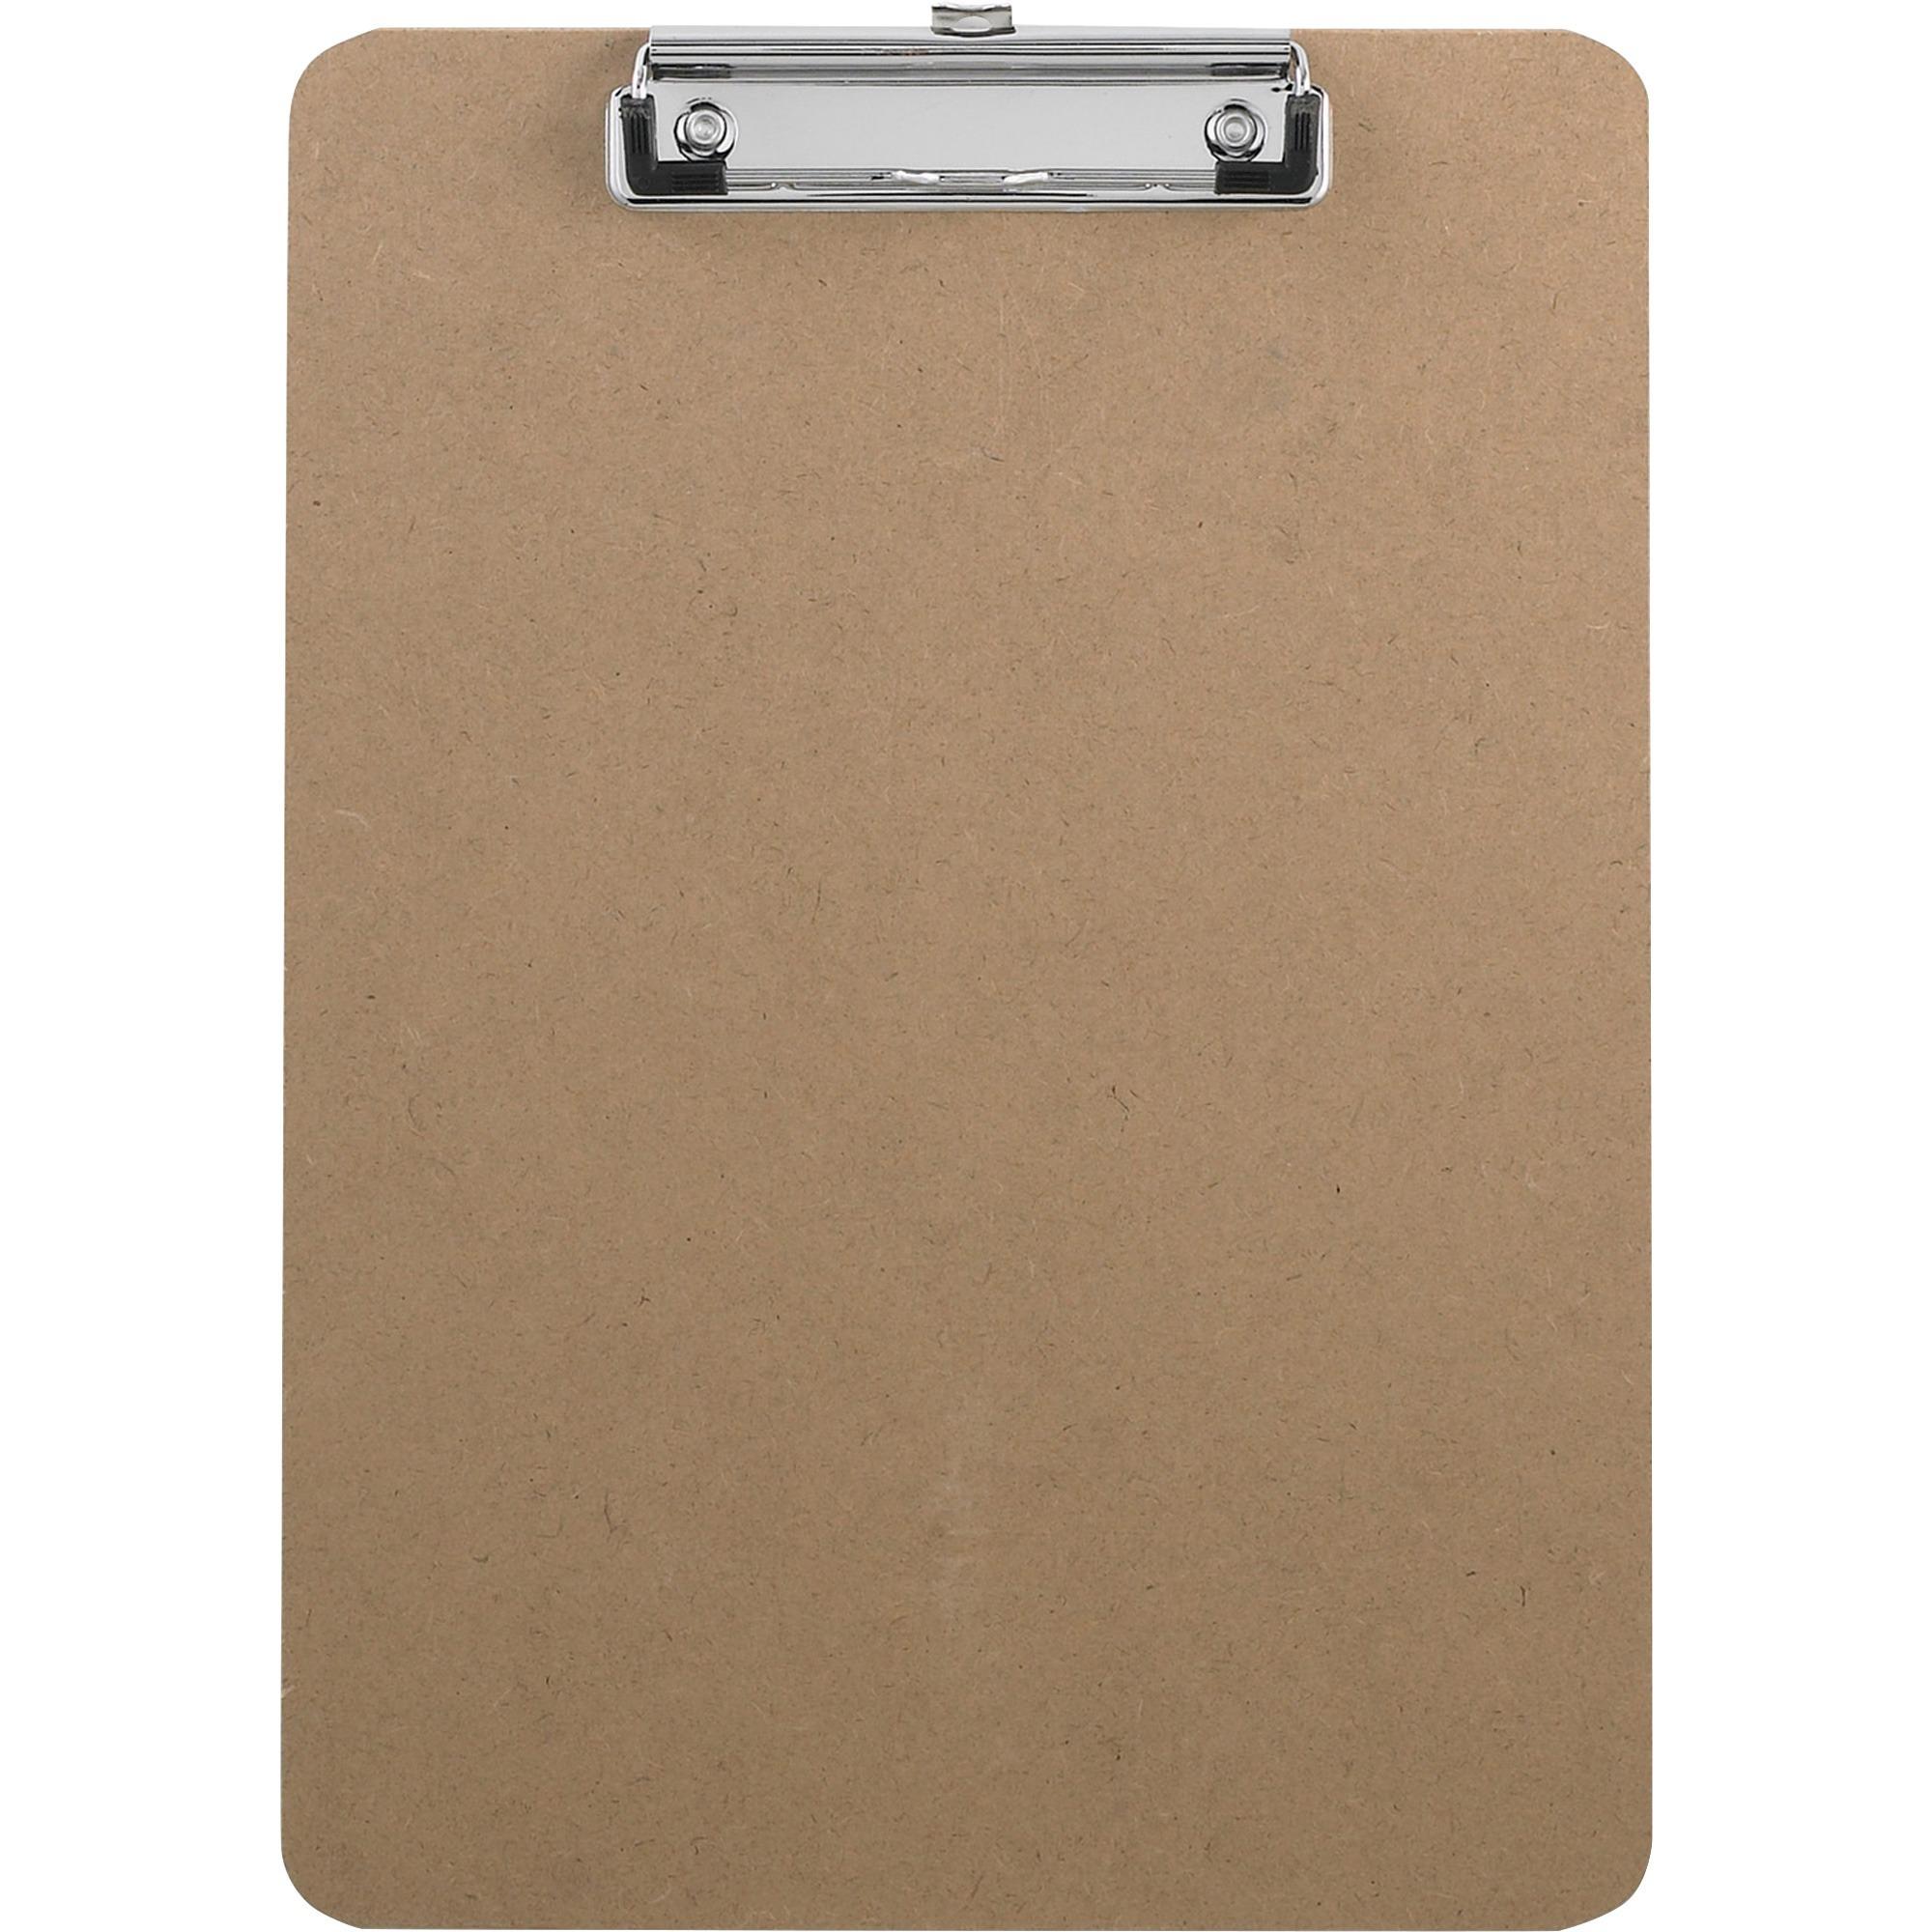 Business Source Hardboard Clipboard 9 Quot X 12 1 2